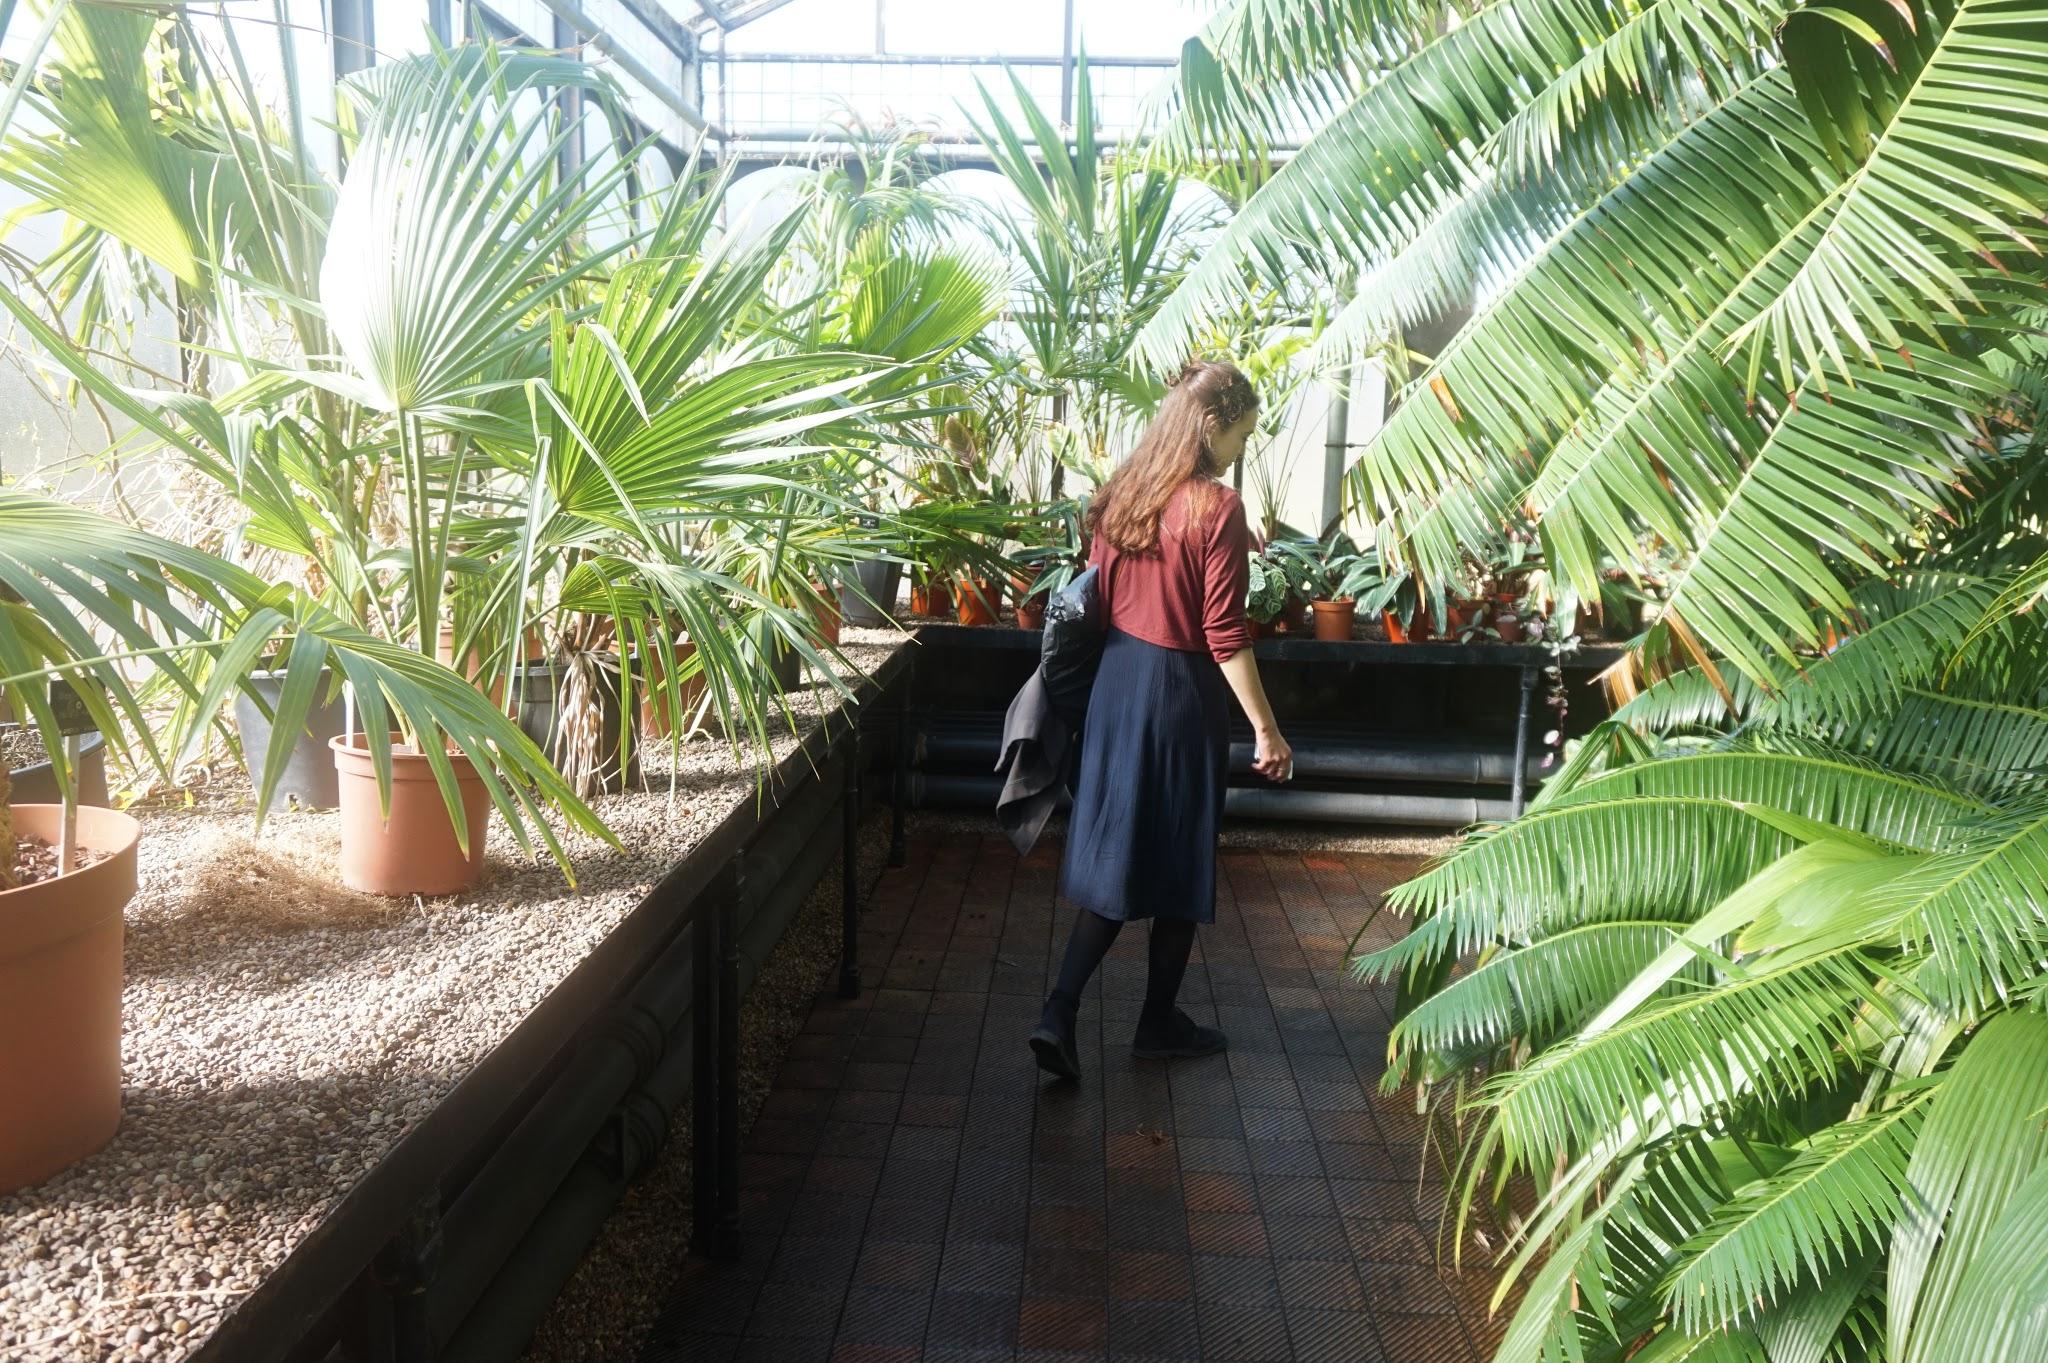 woman walking along walkway in a botanical greenhouse